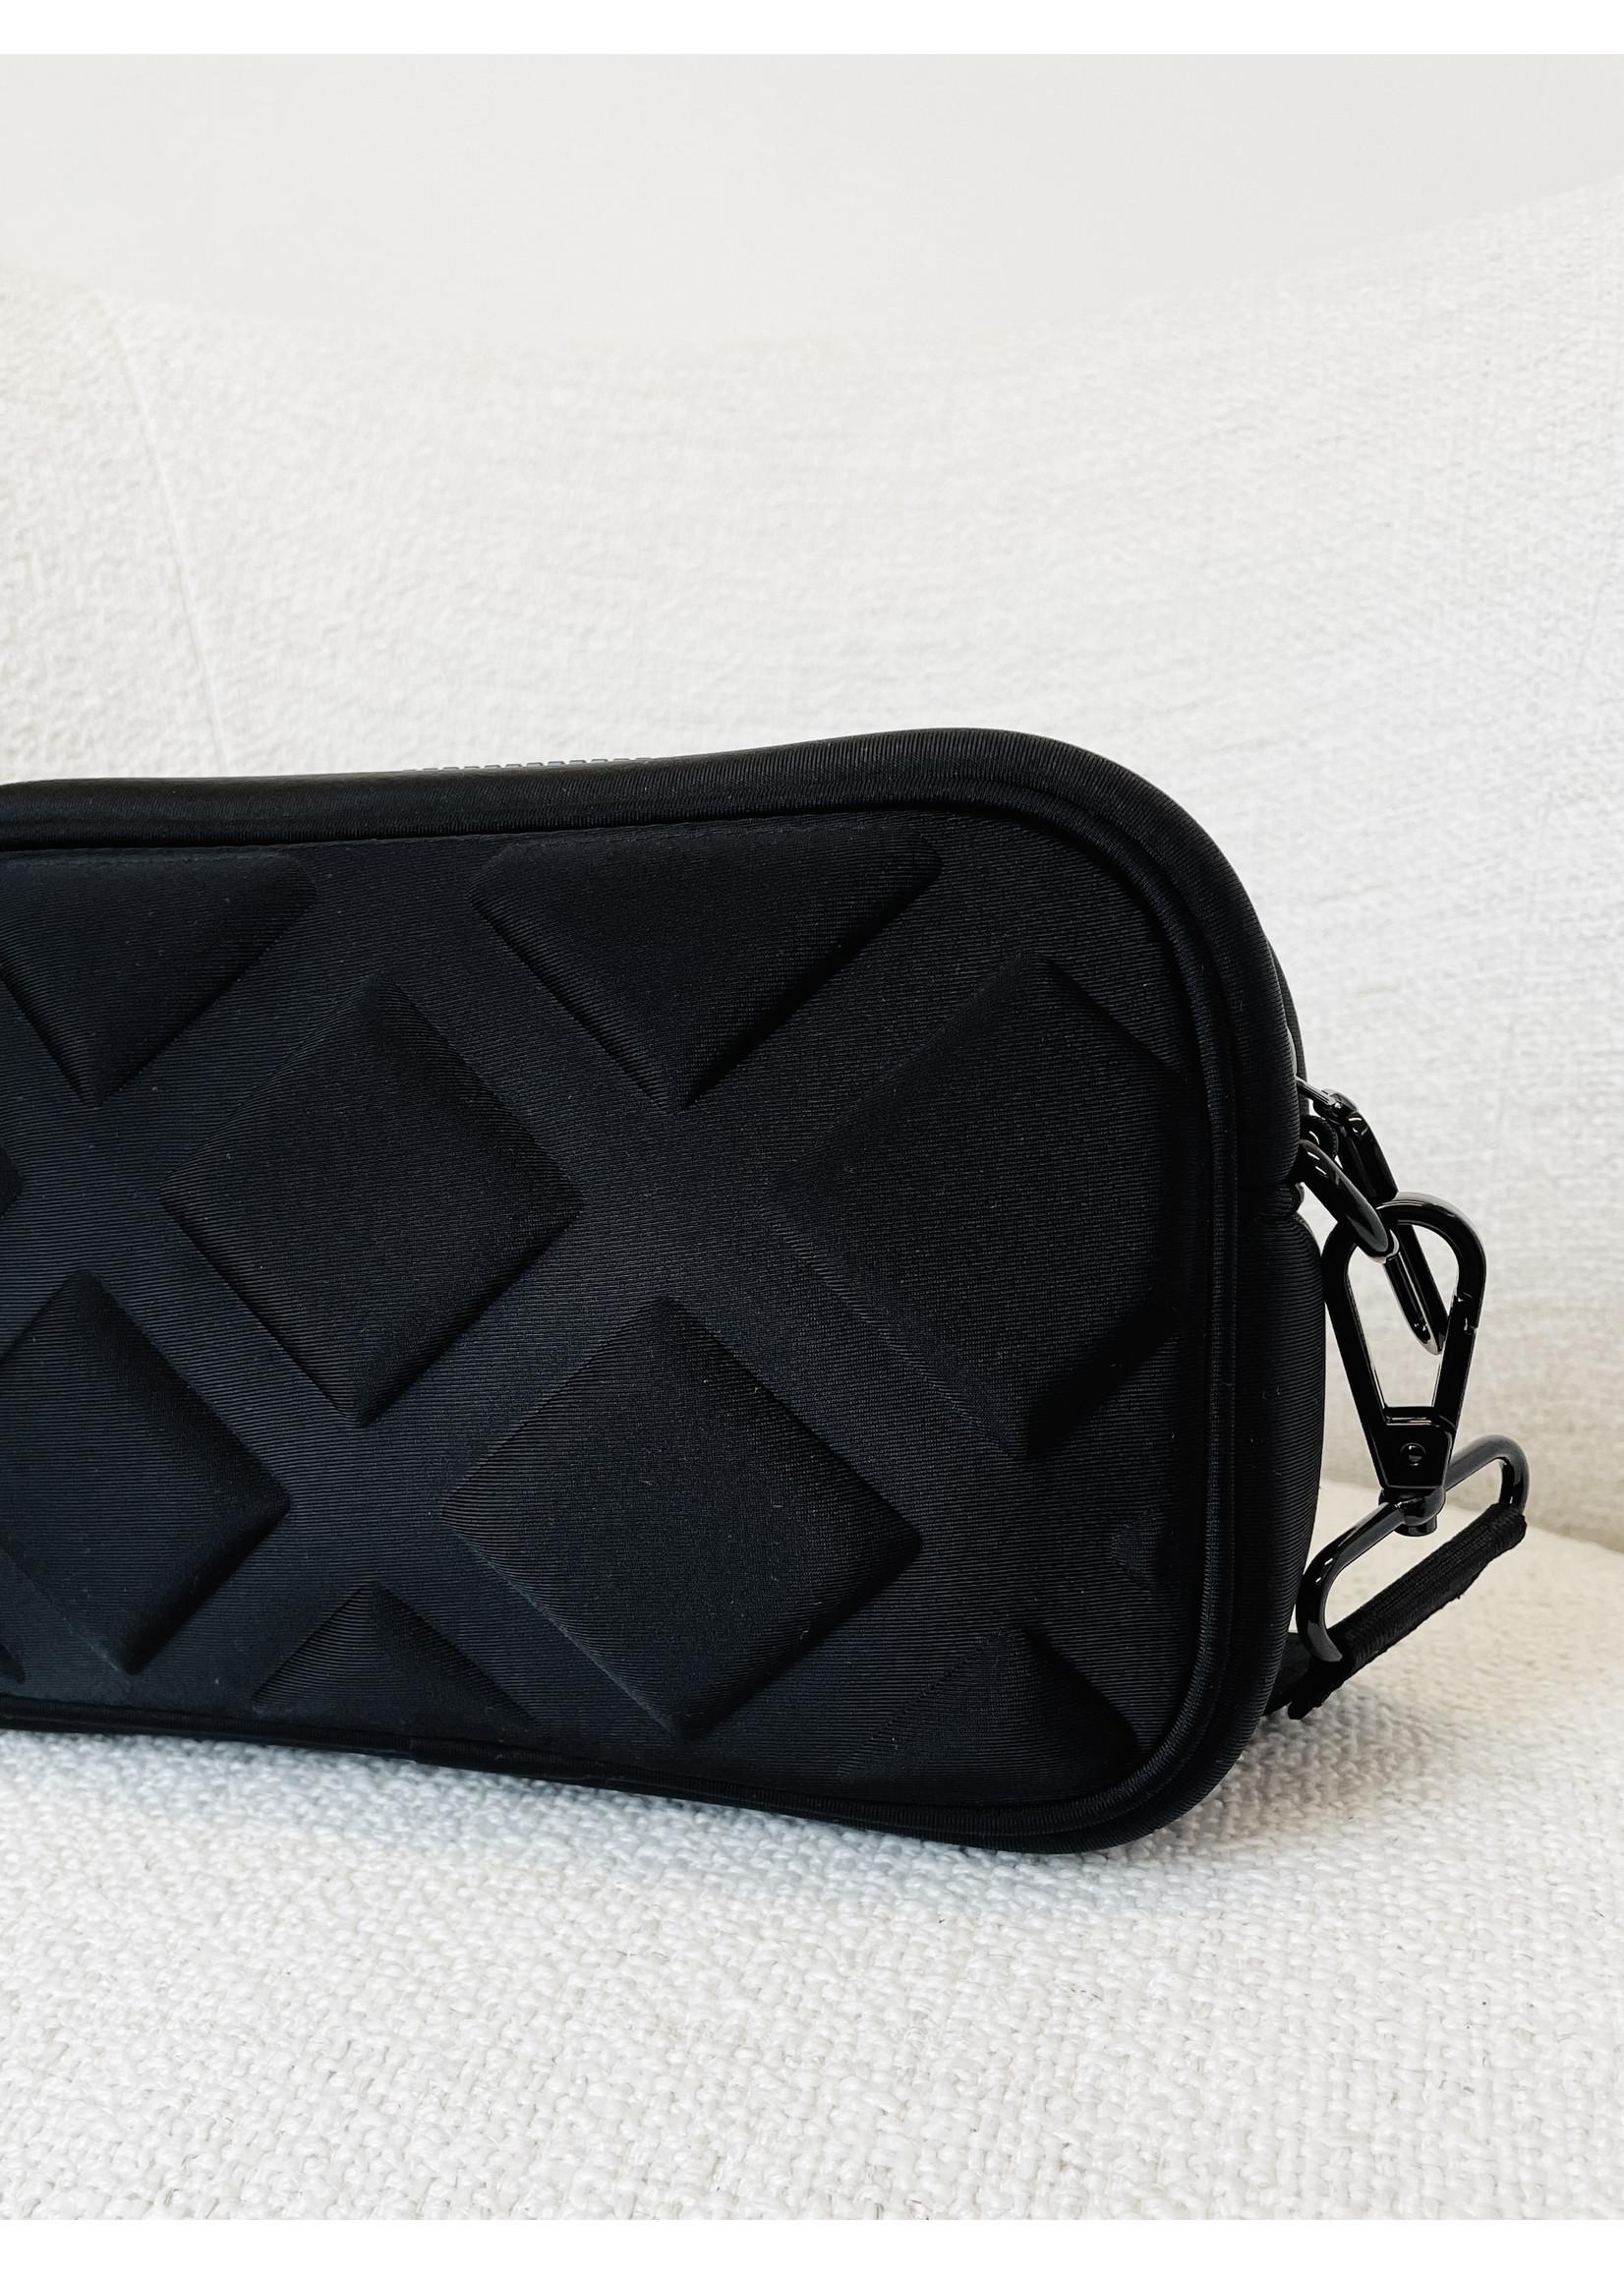 Marccain Bags & Shoes Shopper RB TI.11 J05 black